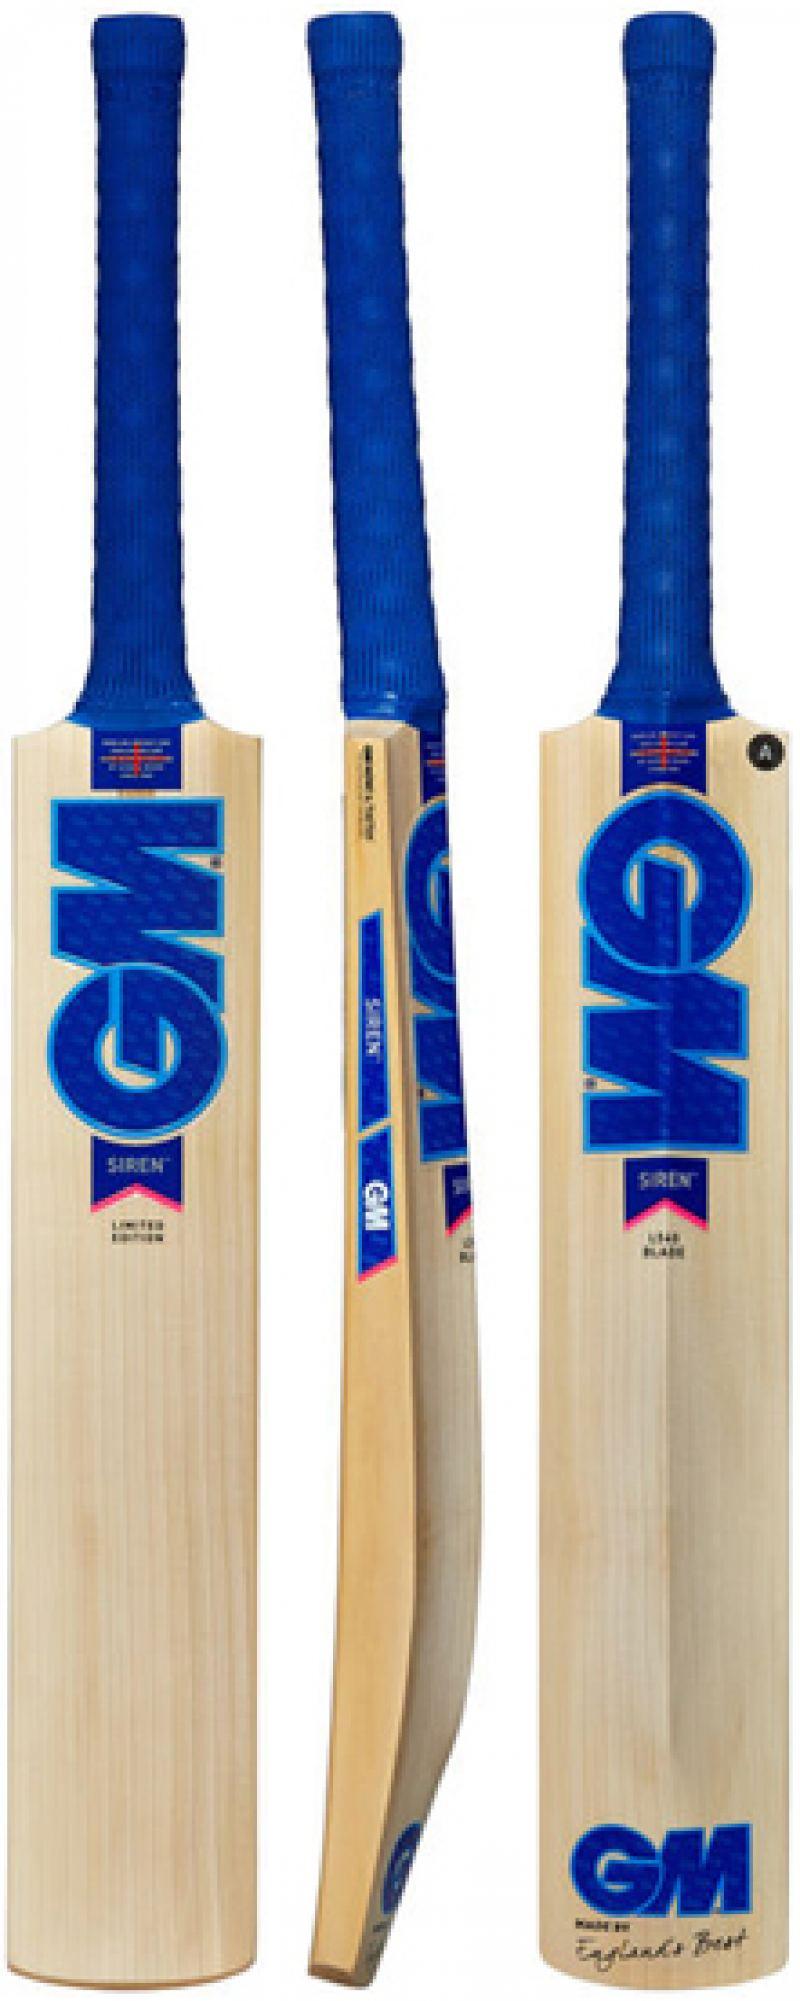 Gunn and Moore Siren L540 DXM Signature Cricket Bat